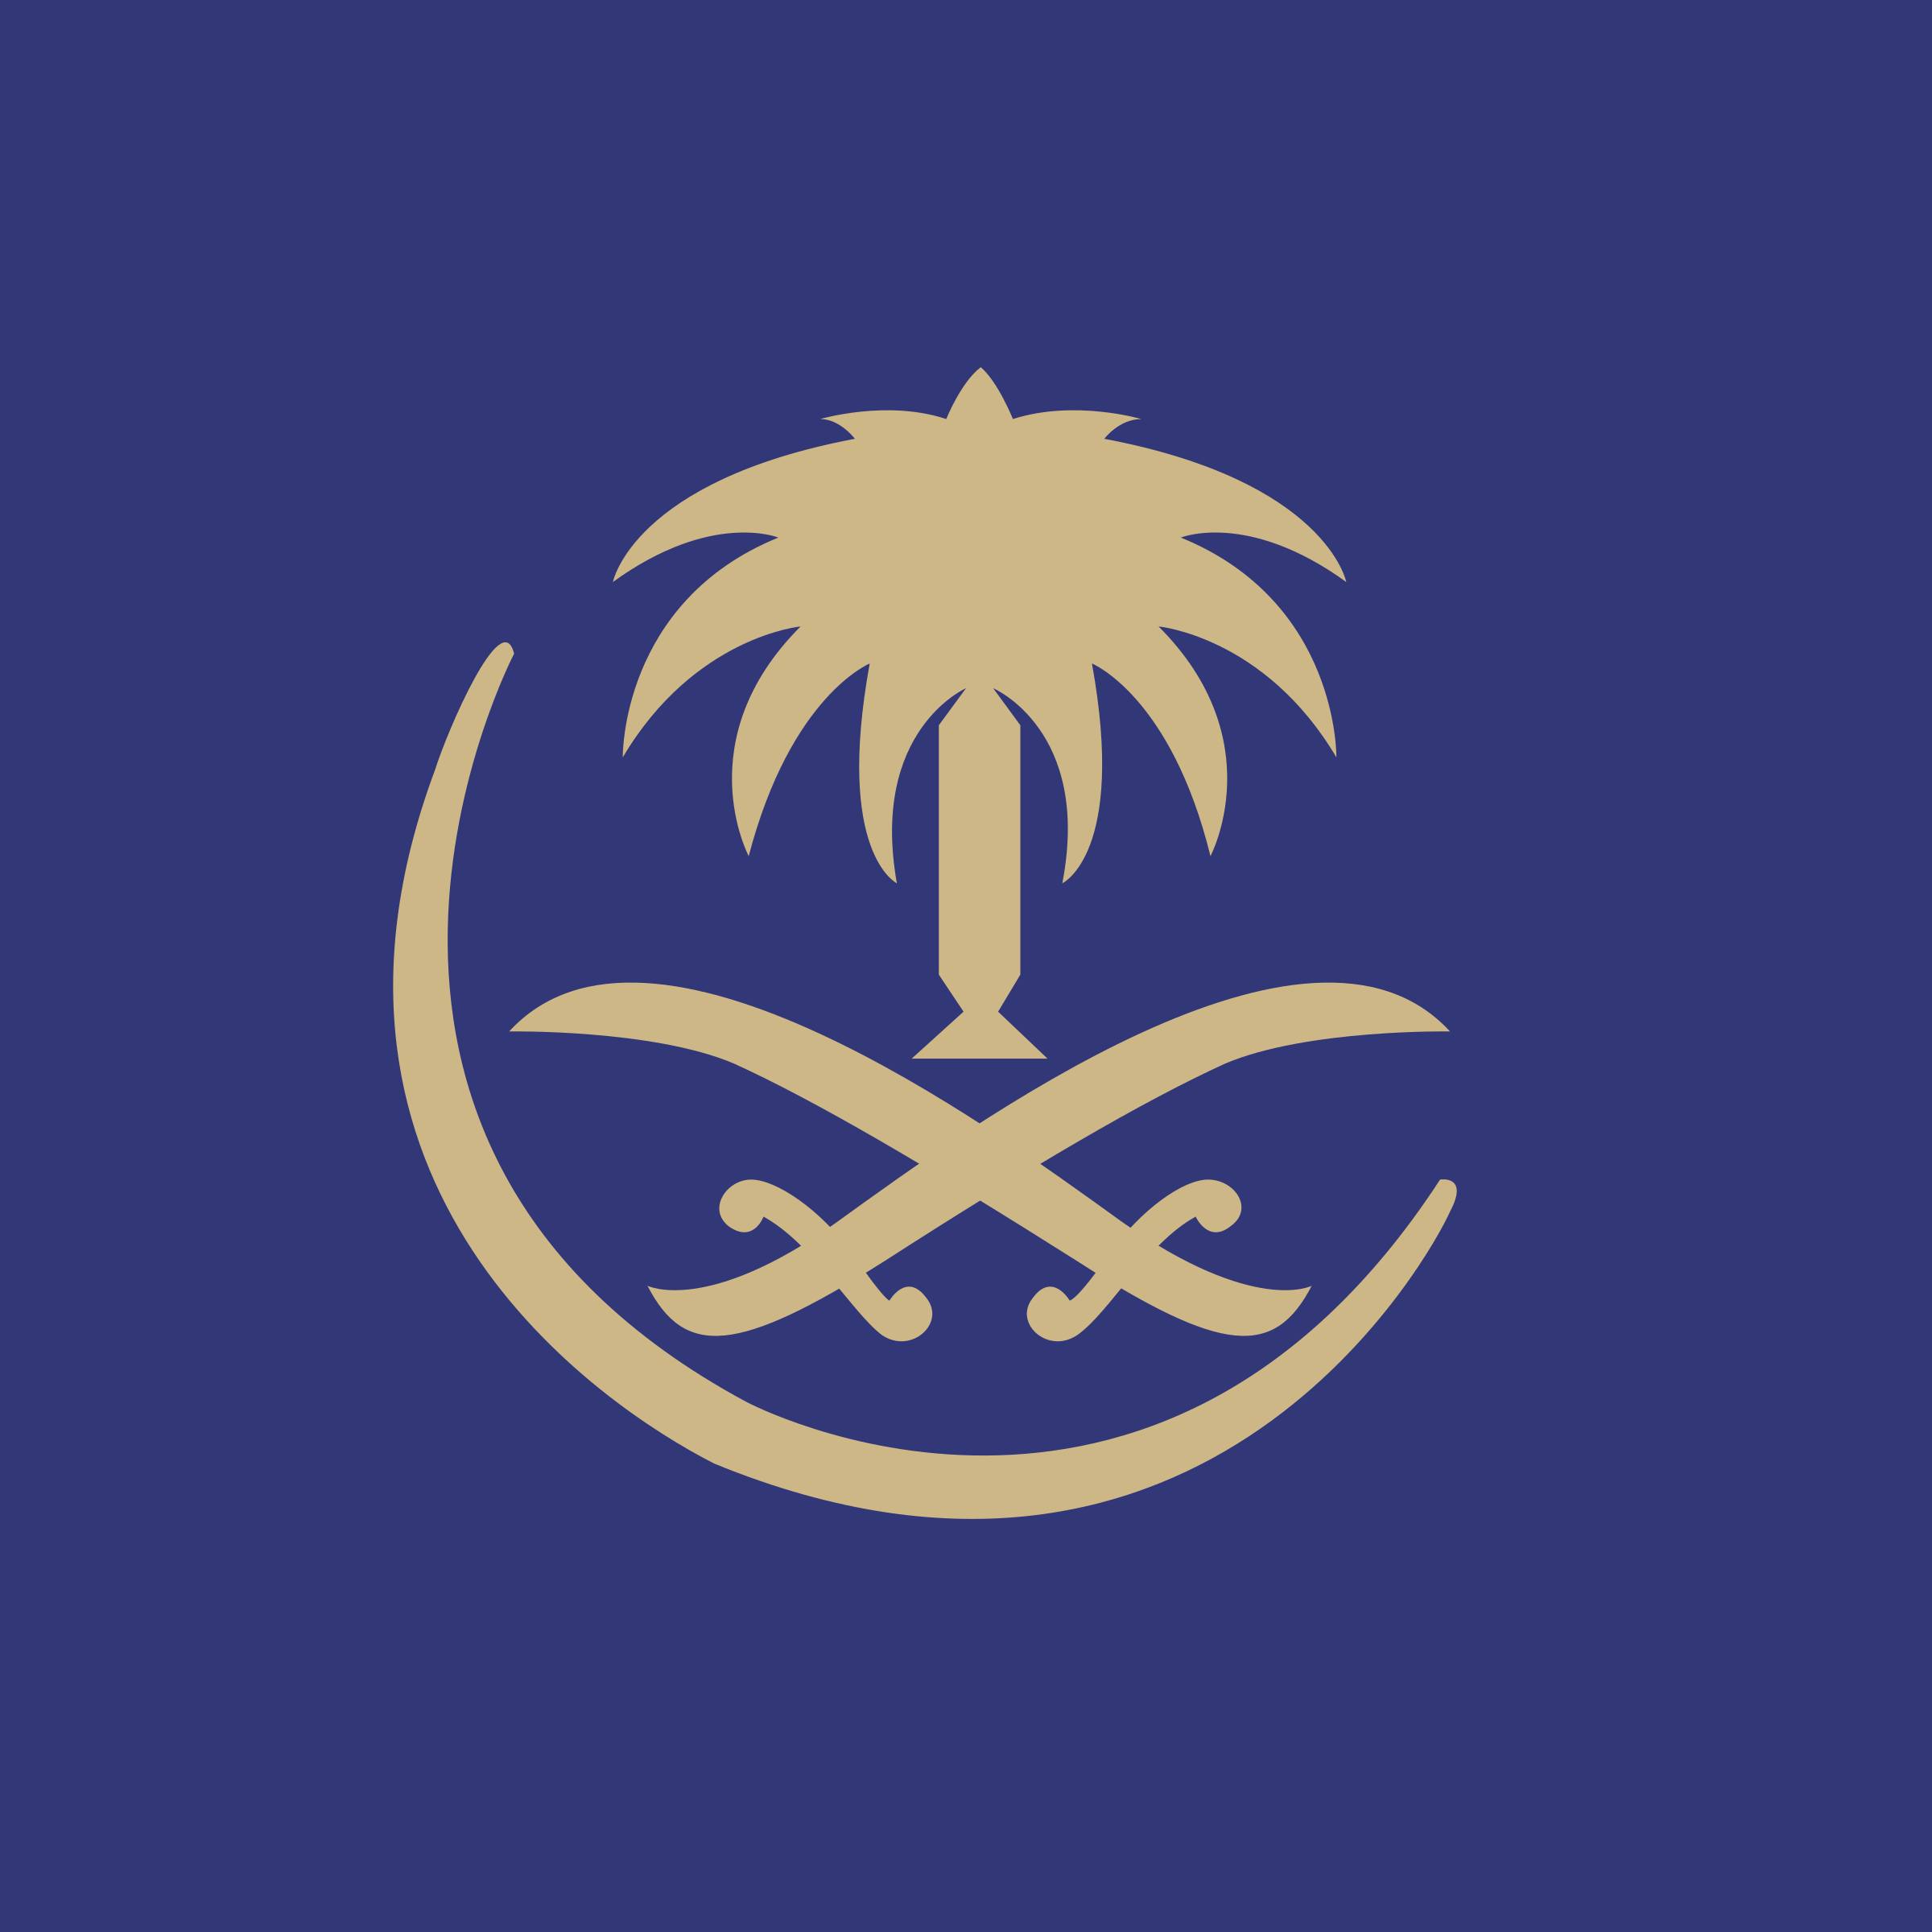 Saudi Arabian Airlines Logo PNG Transparent & SVG Vector.